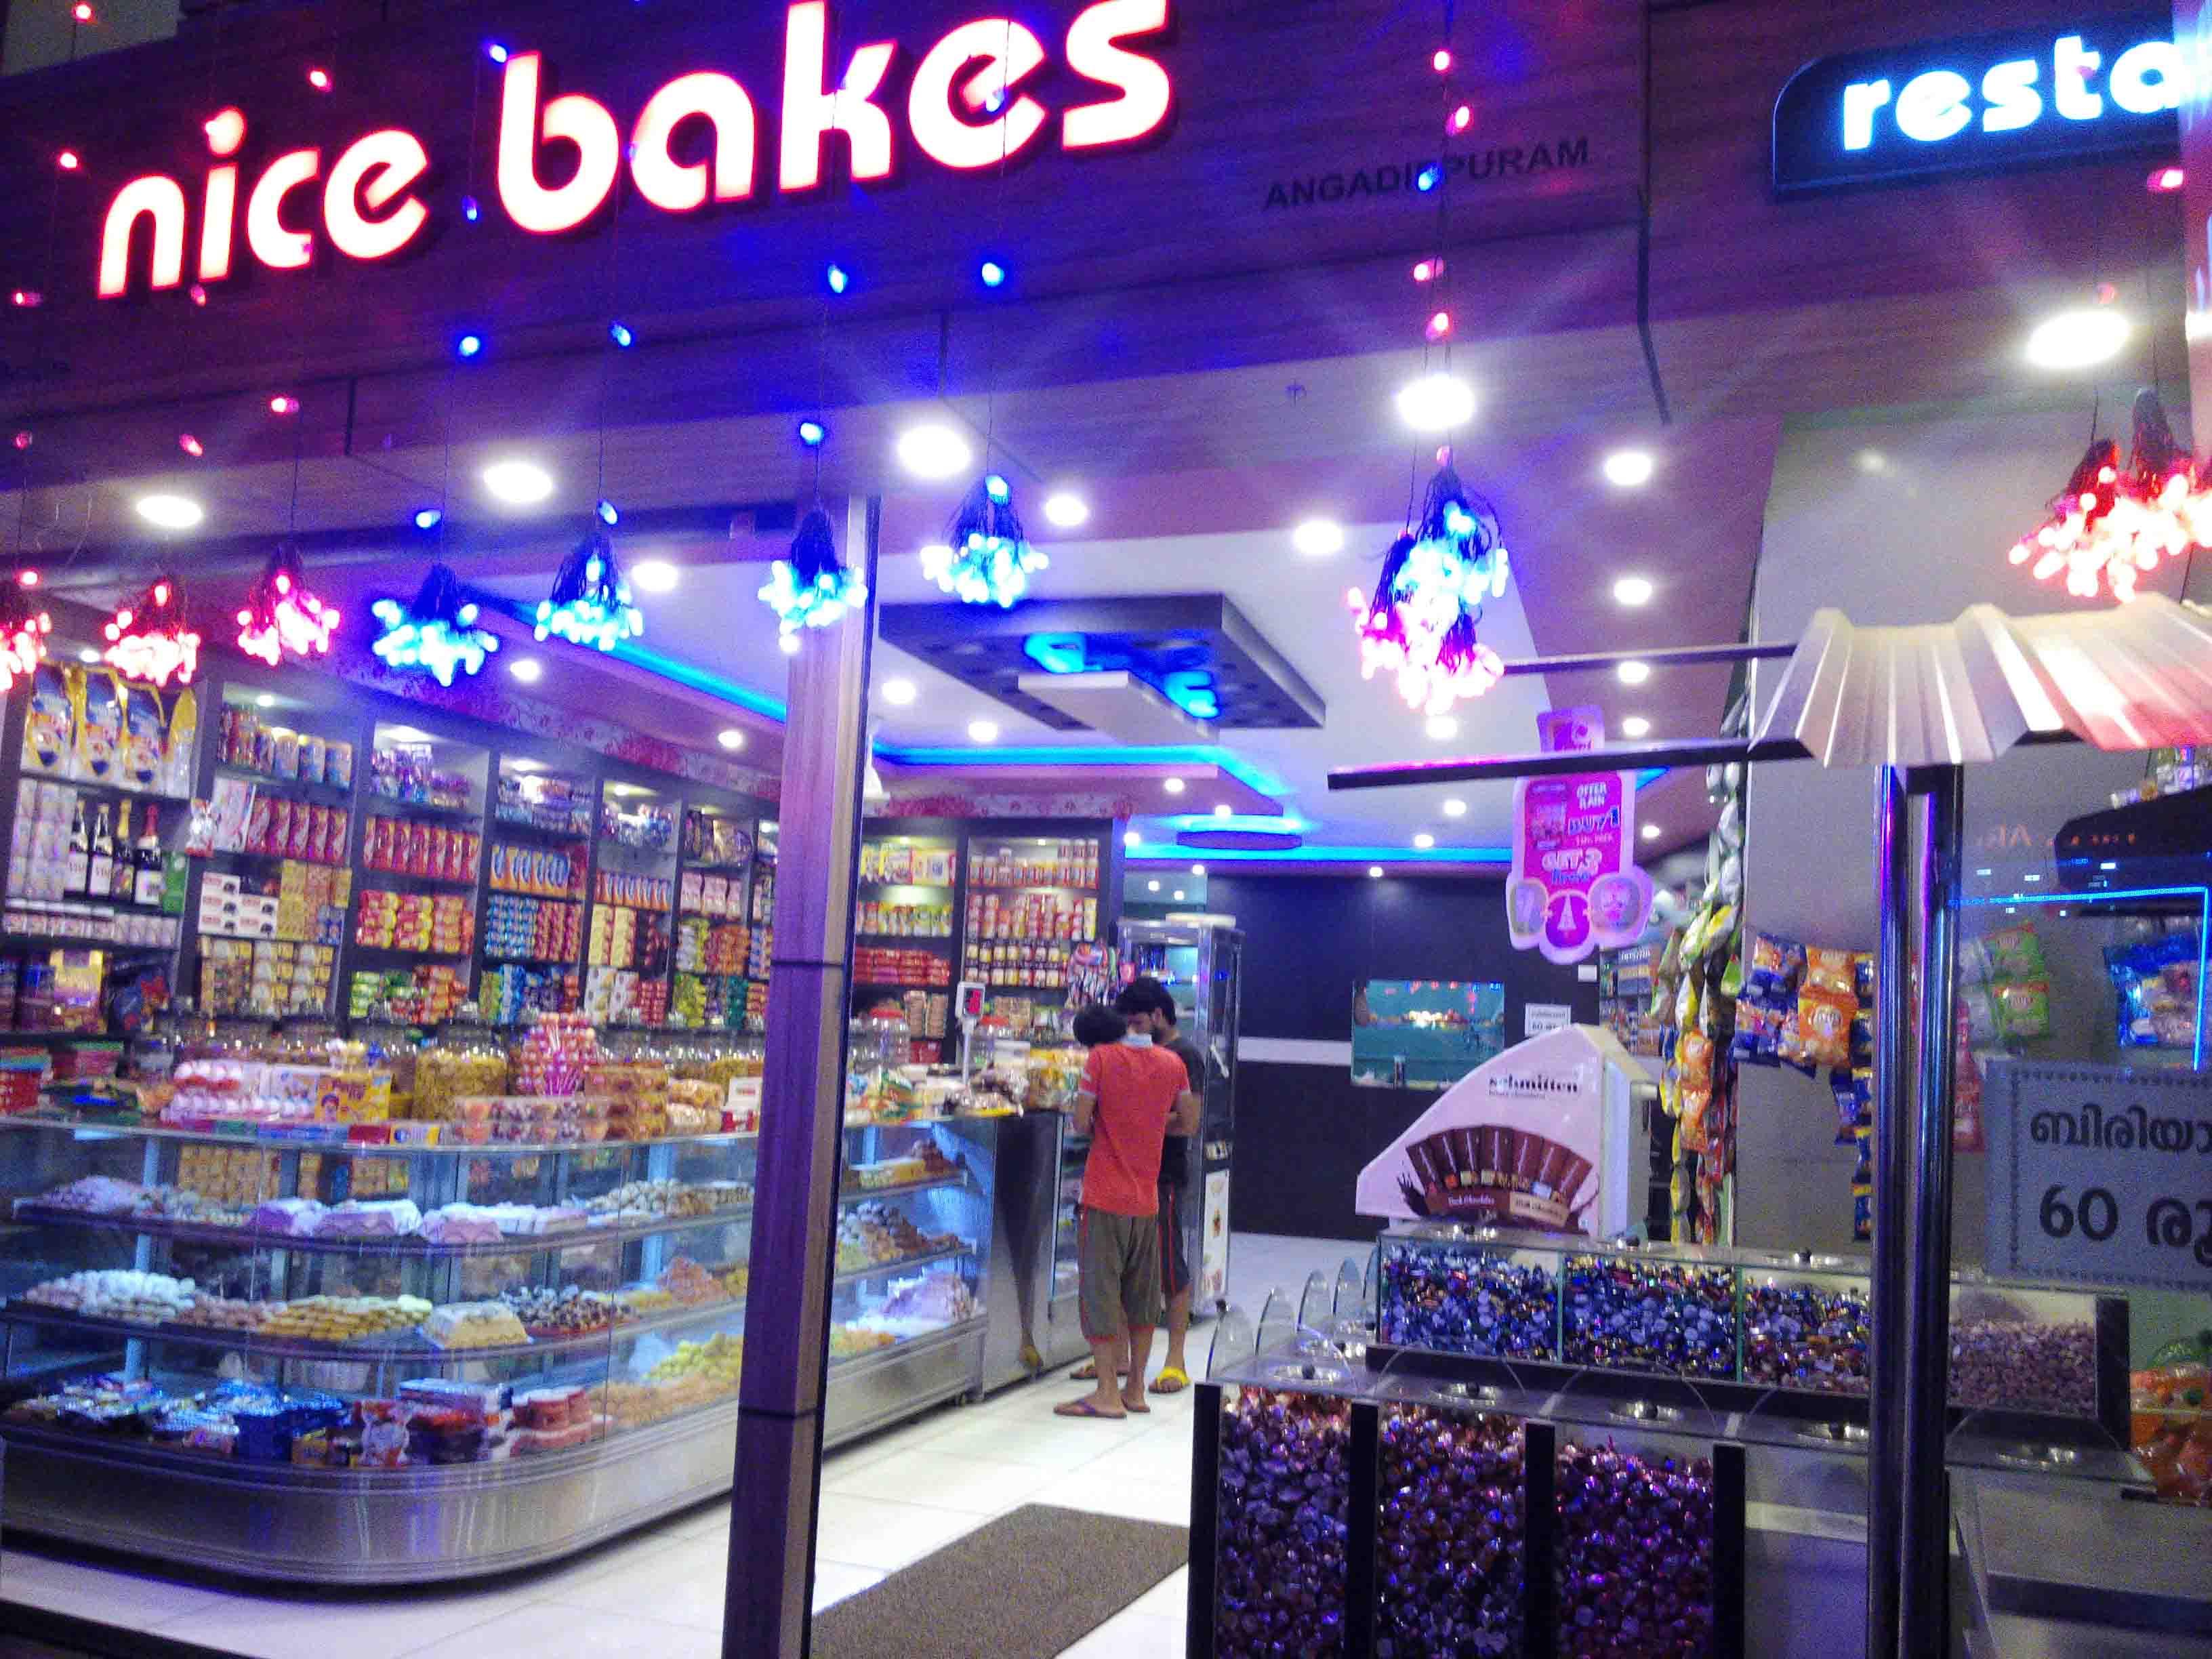 nice bakery